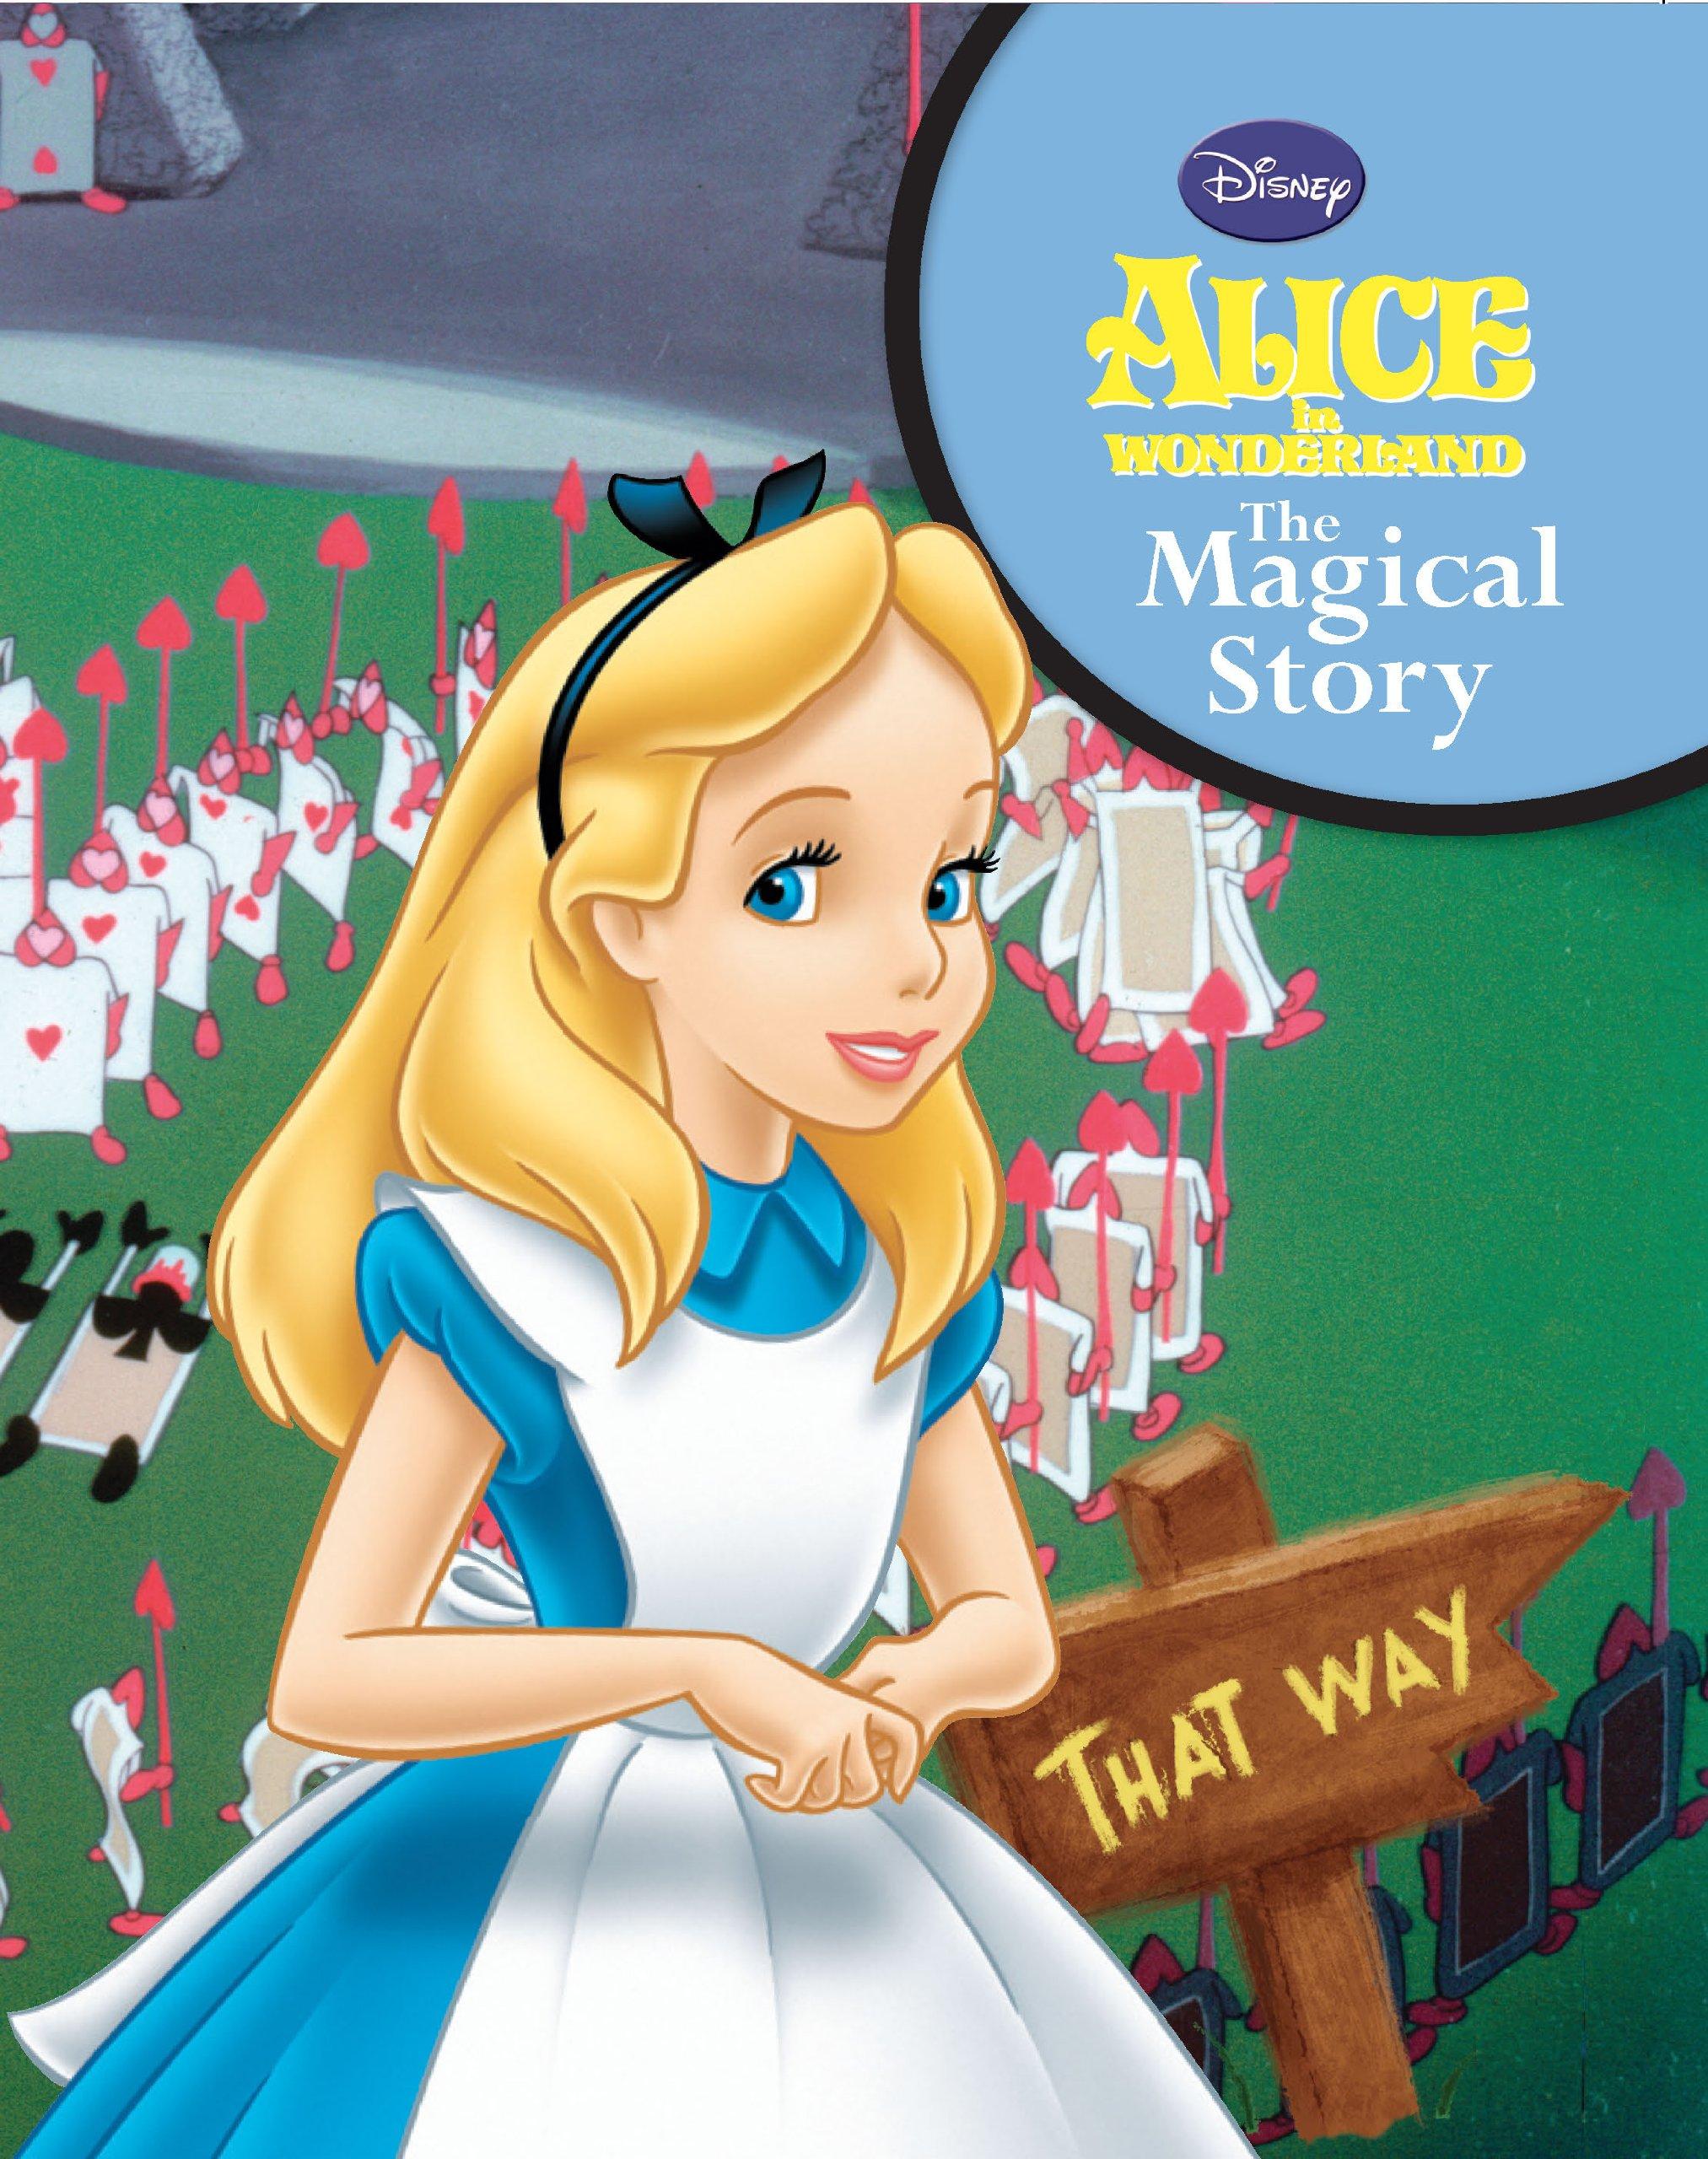 Alice In Wonderland Book Cover Ideas ~ Disneys alice in wonderland: parragon books: 9781407587608: amazon